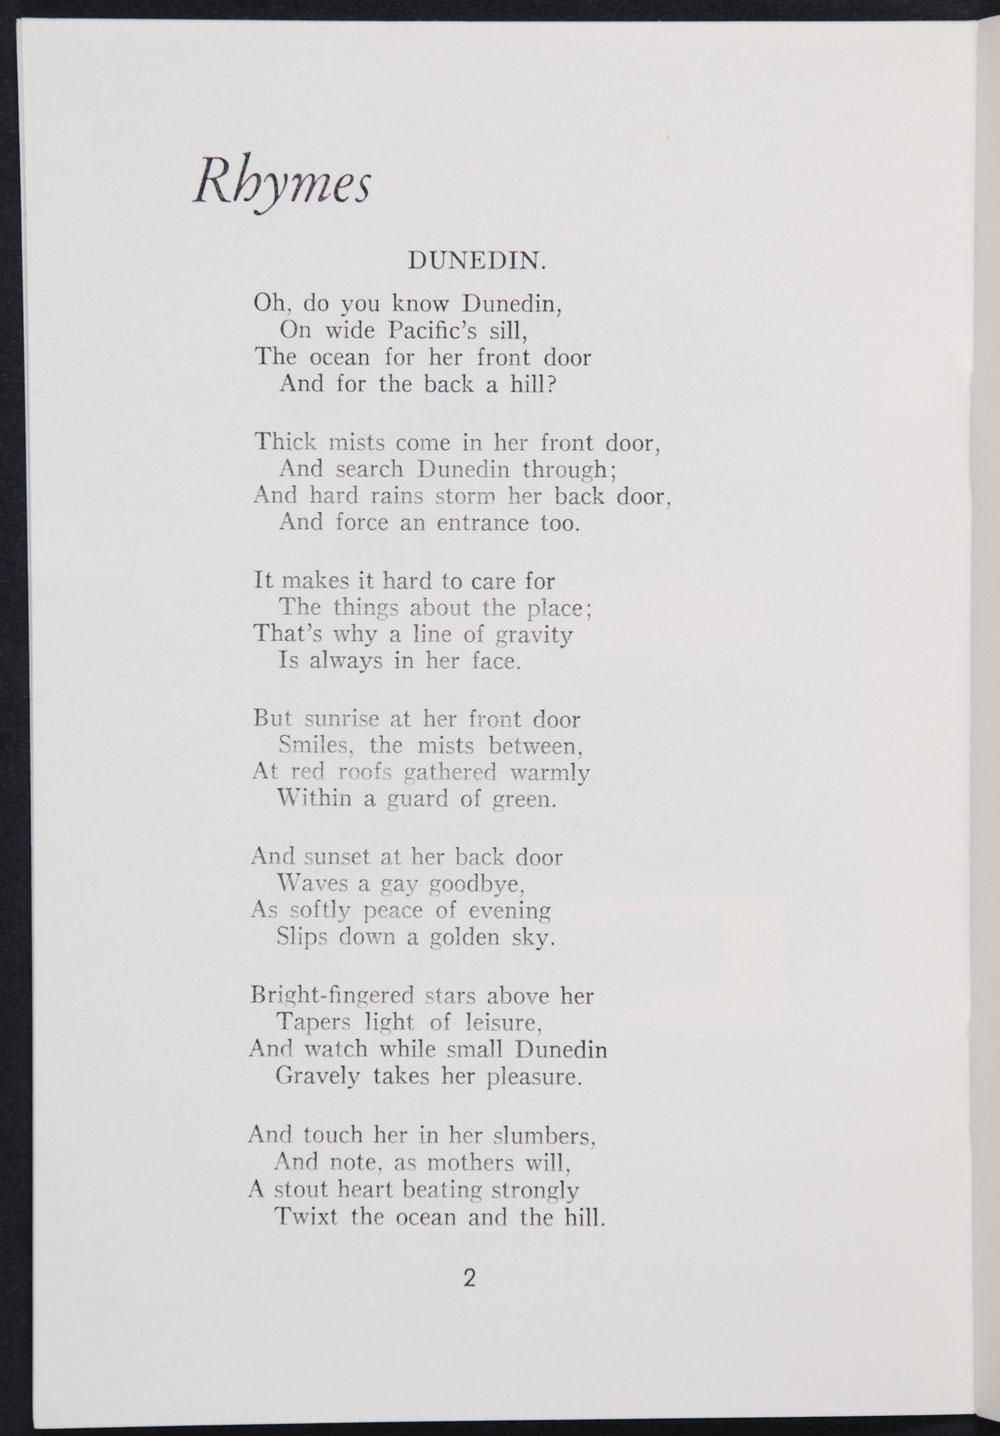 Pansy McLachlan. <em>Dunedin rhymes and times.</em> Dunedin: Stewart, Smith & Hall, [1965]